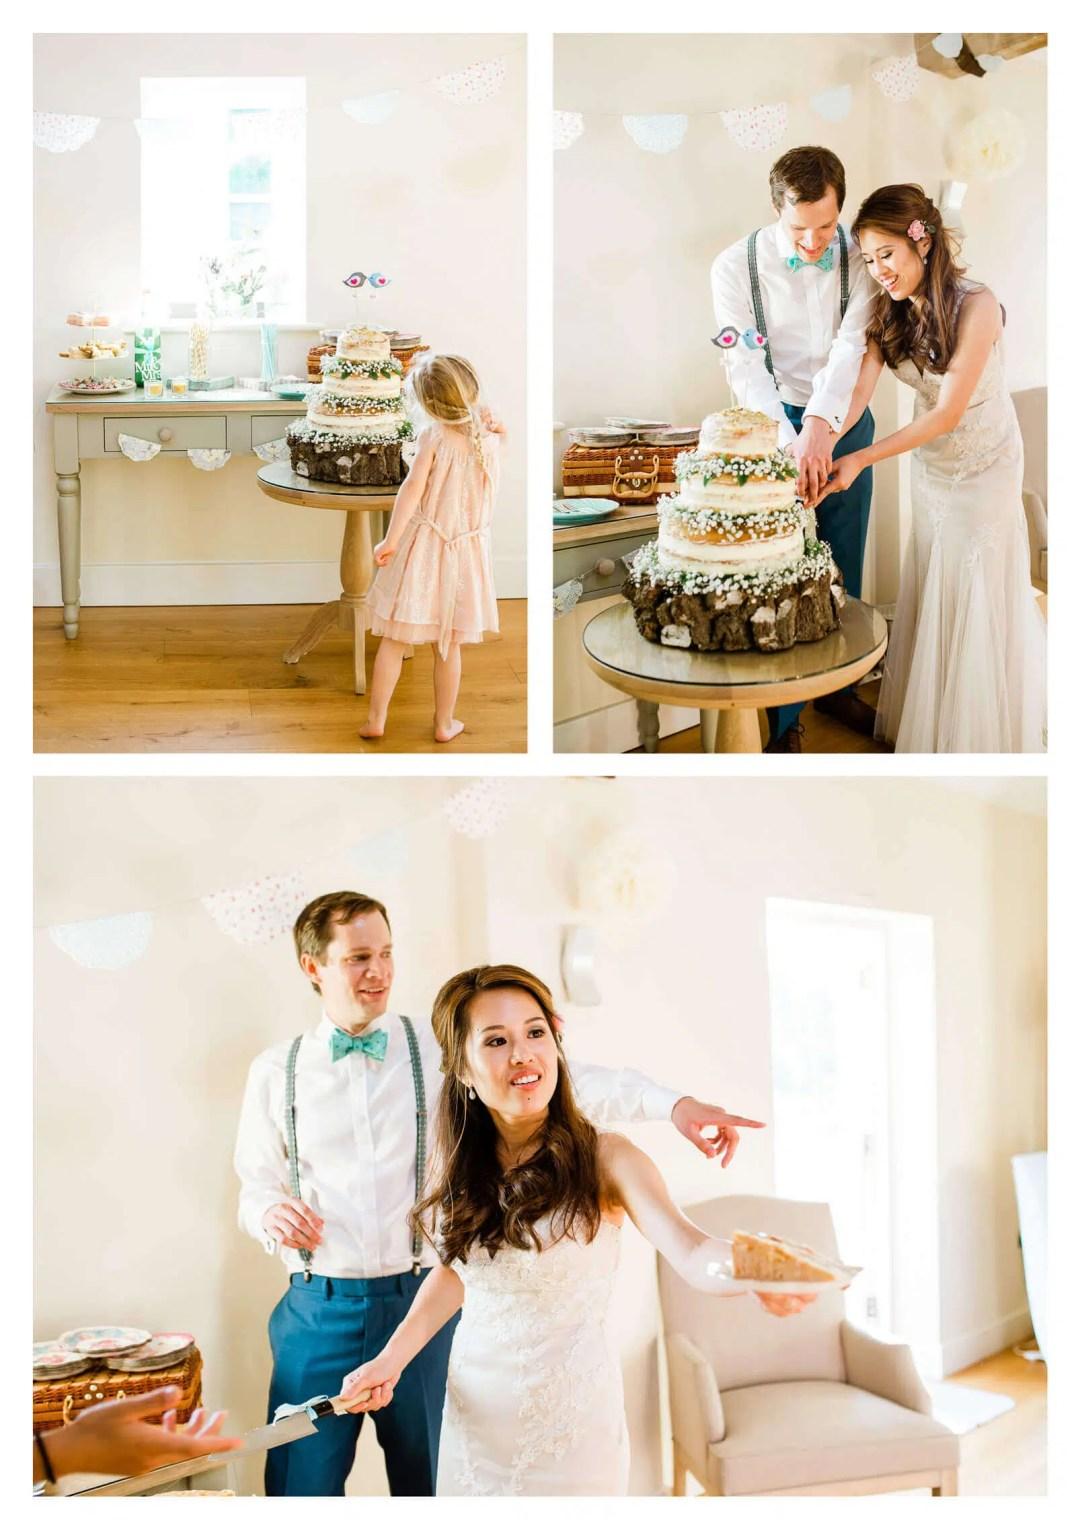 Finchcocks Oast wedding cake cutting made by groom | Kent wedding photographer